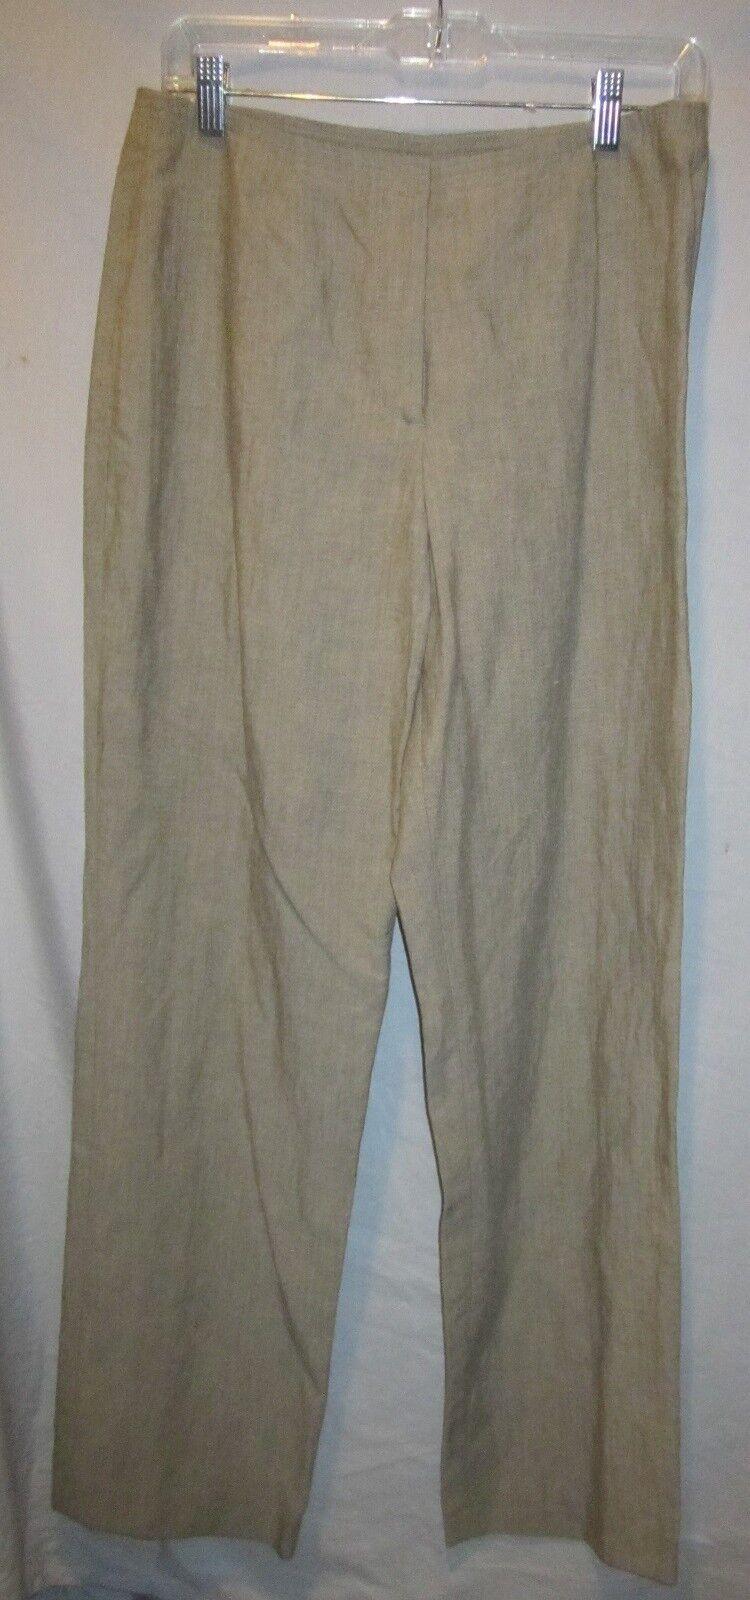 SIGRID OLSEN SPORT DARK TAUPE LINEN BLEND DRESS PANTS SZ 8 NWOTS  139 RETAIL